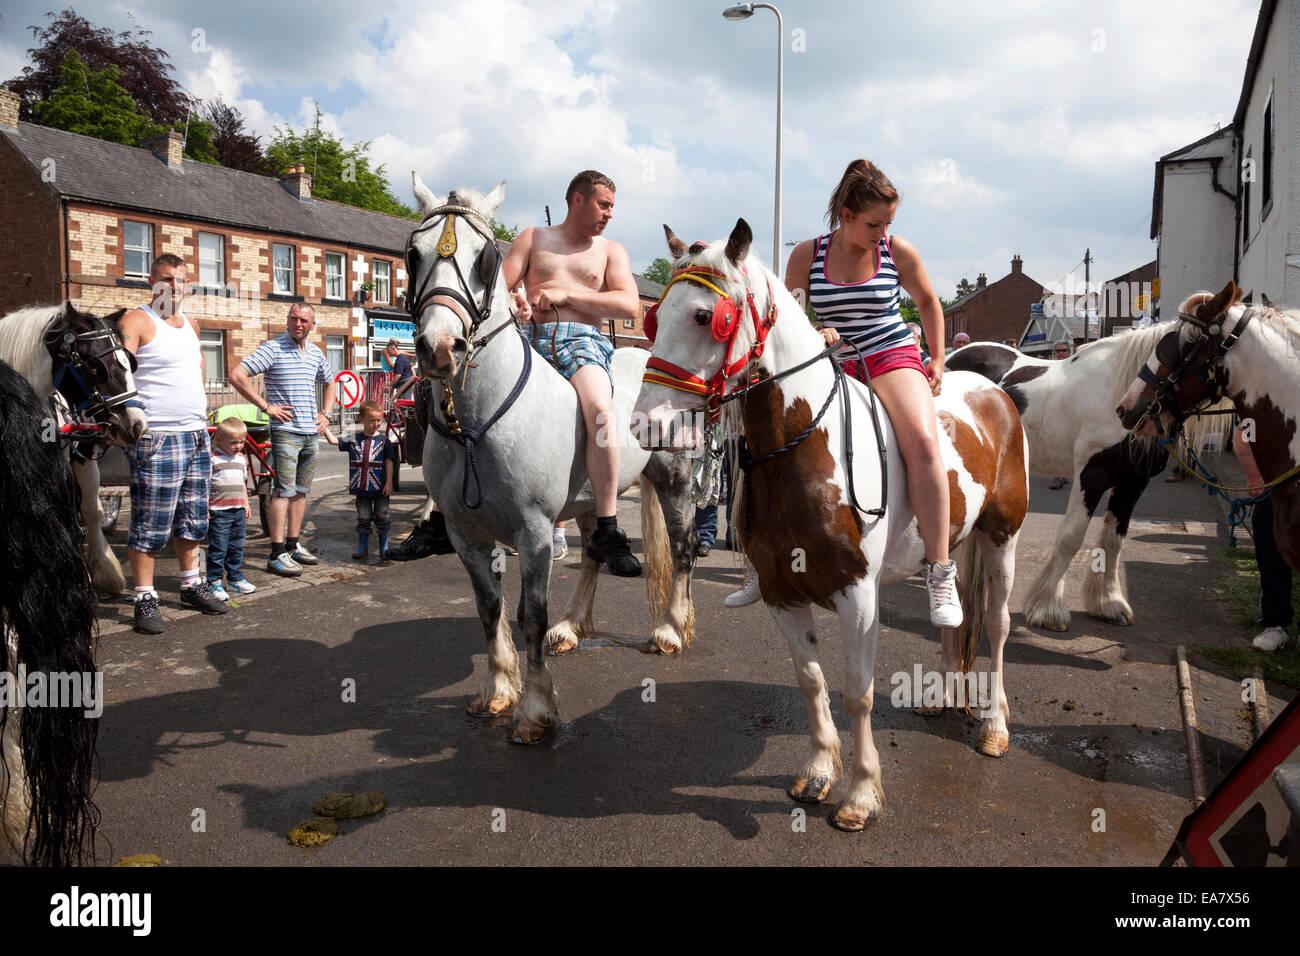 The Appleby Horse Fair, Appleby-In-Westmorland, Cumbria, England, U.K. - Stock Image